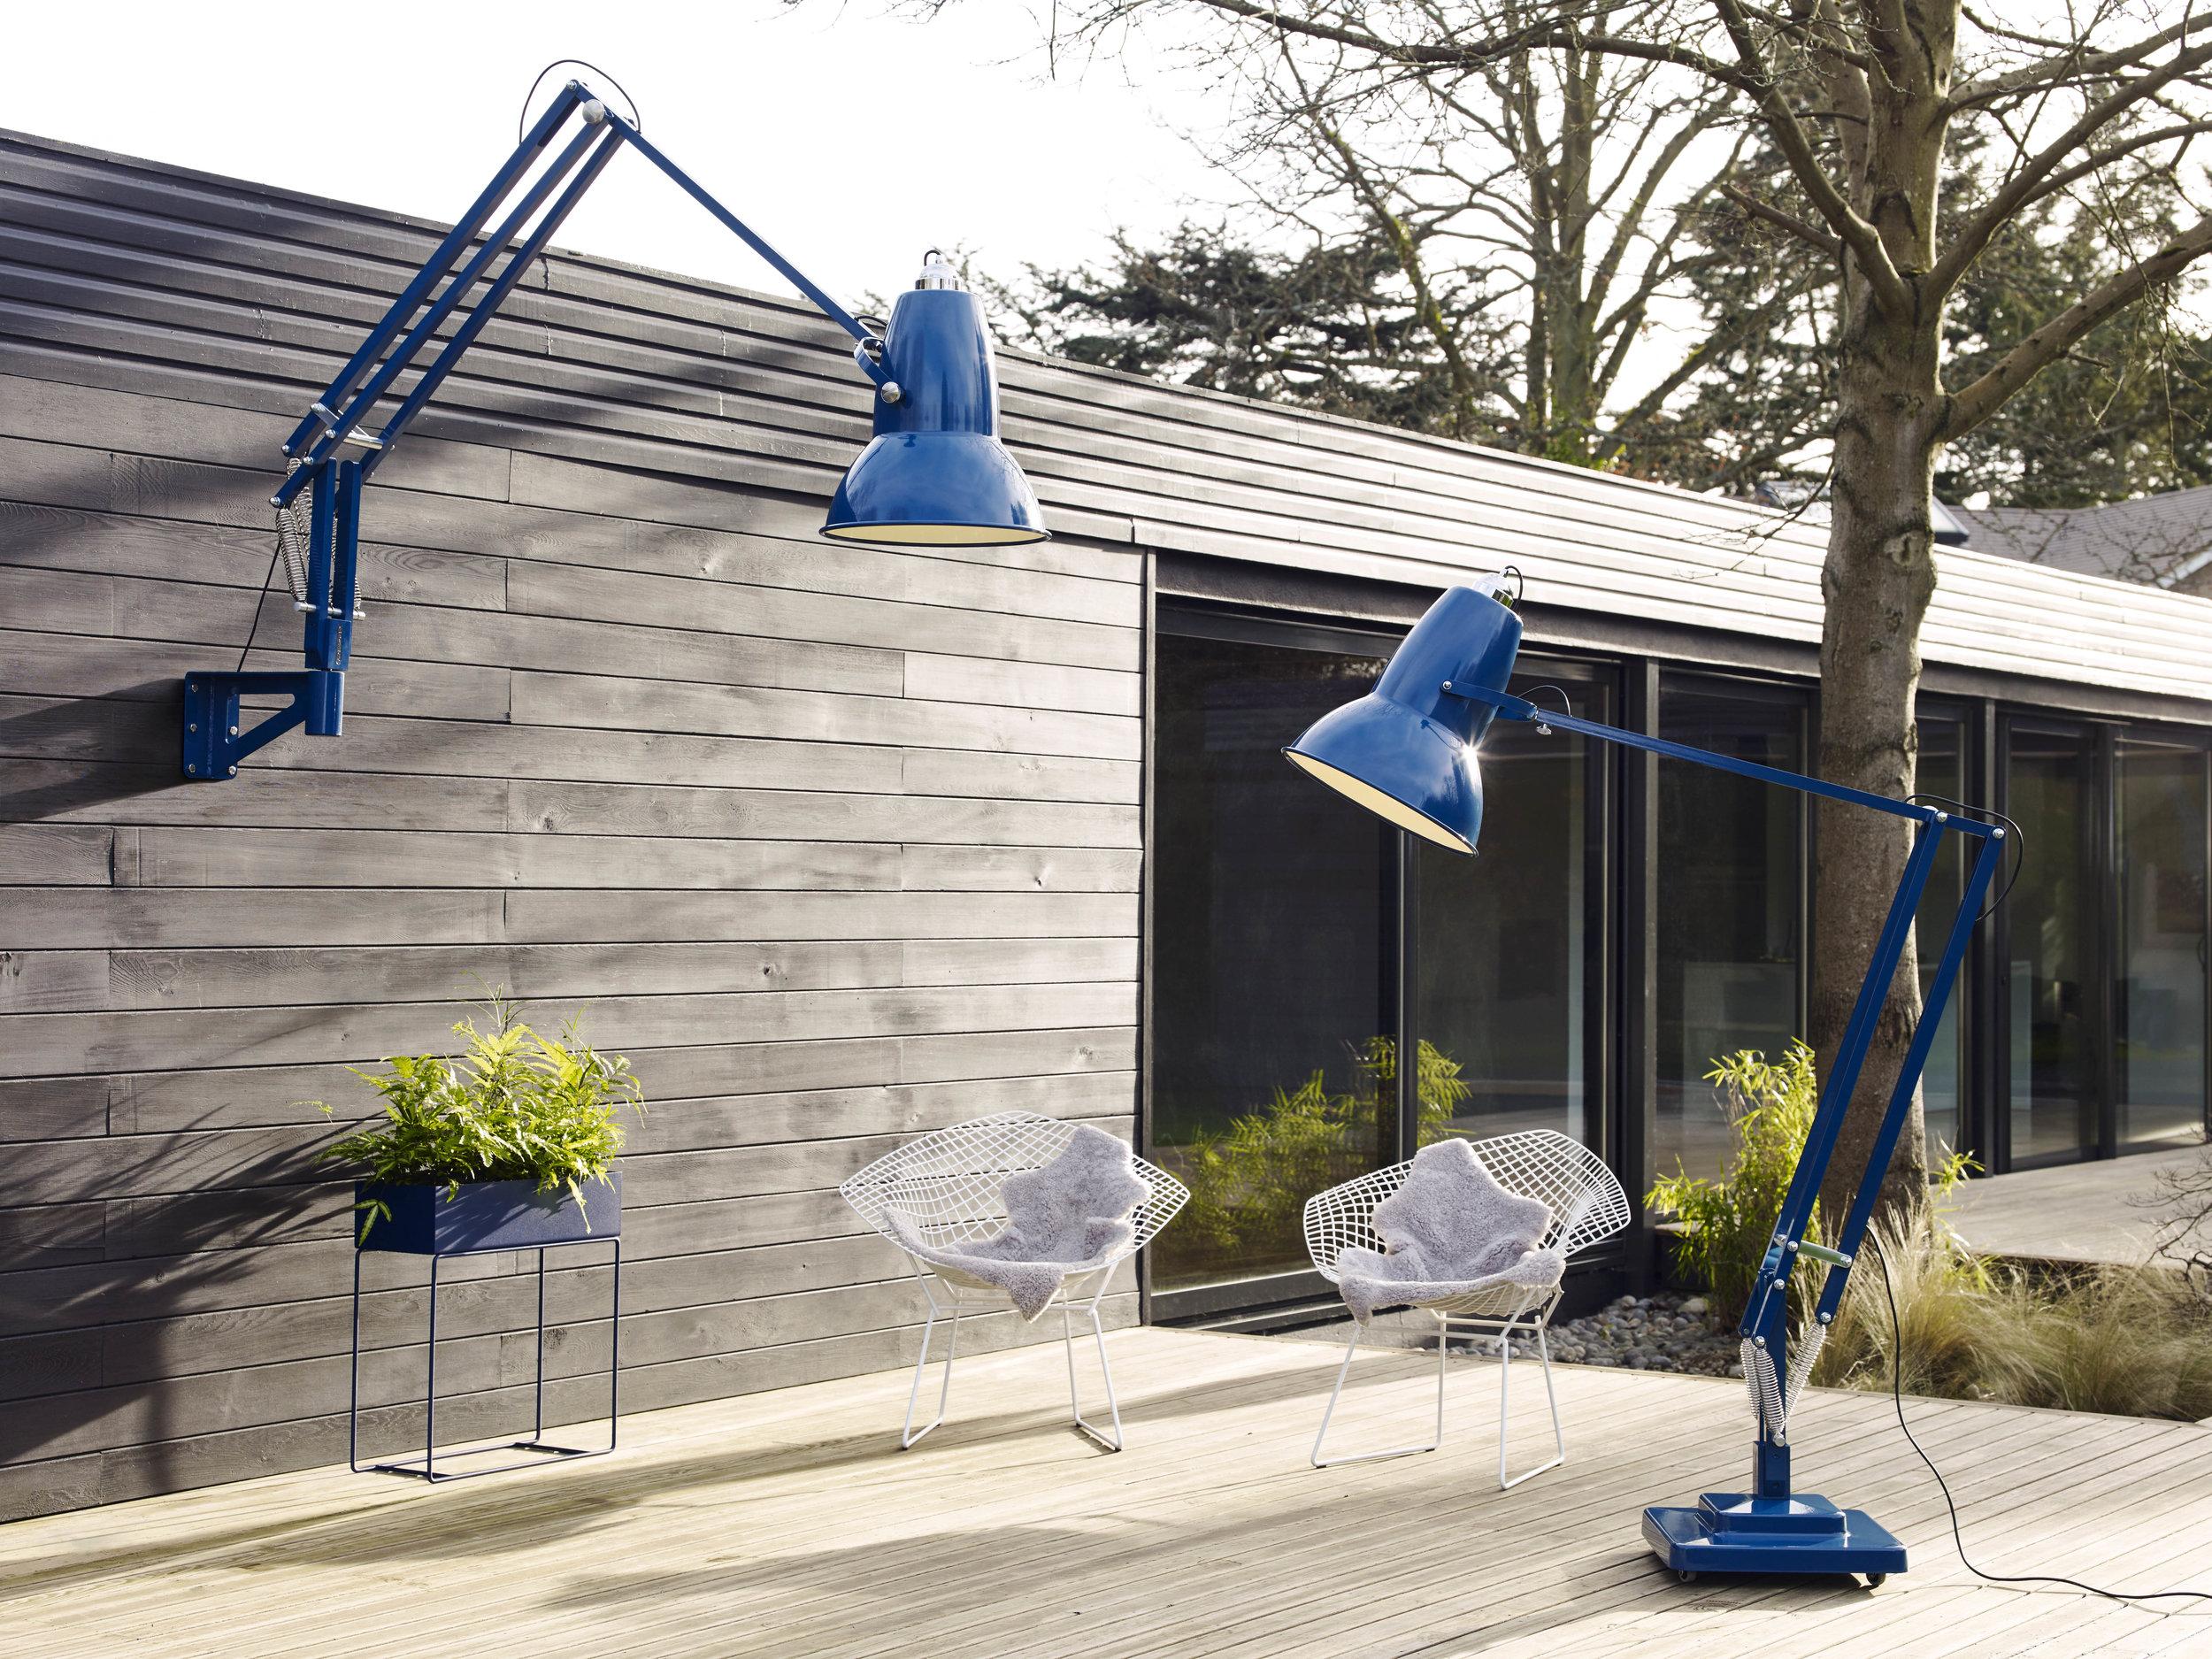 Original 1227 Giant Outdoor lamp